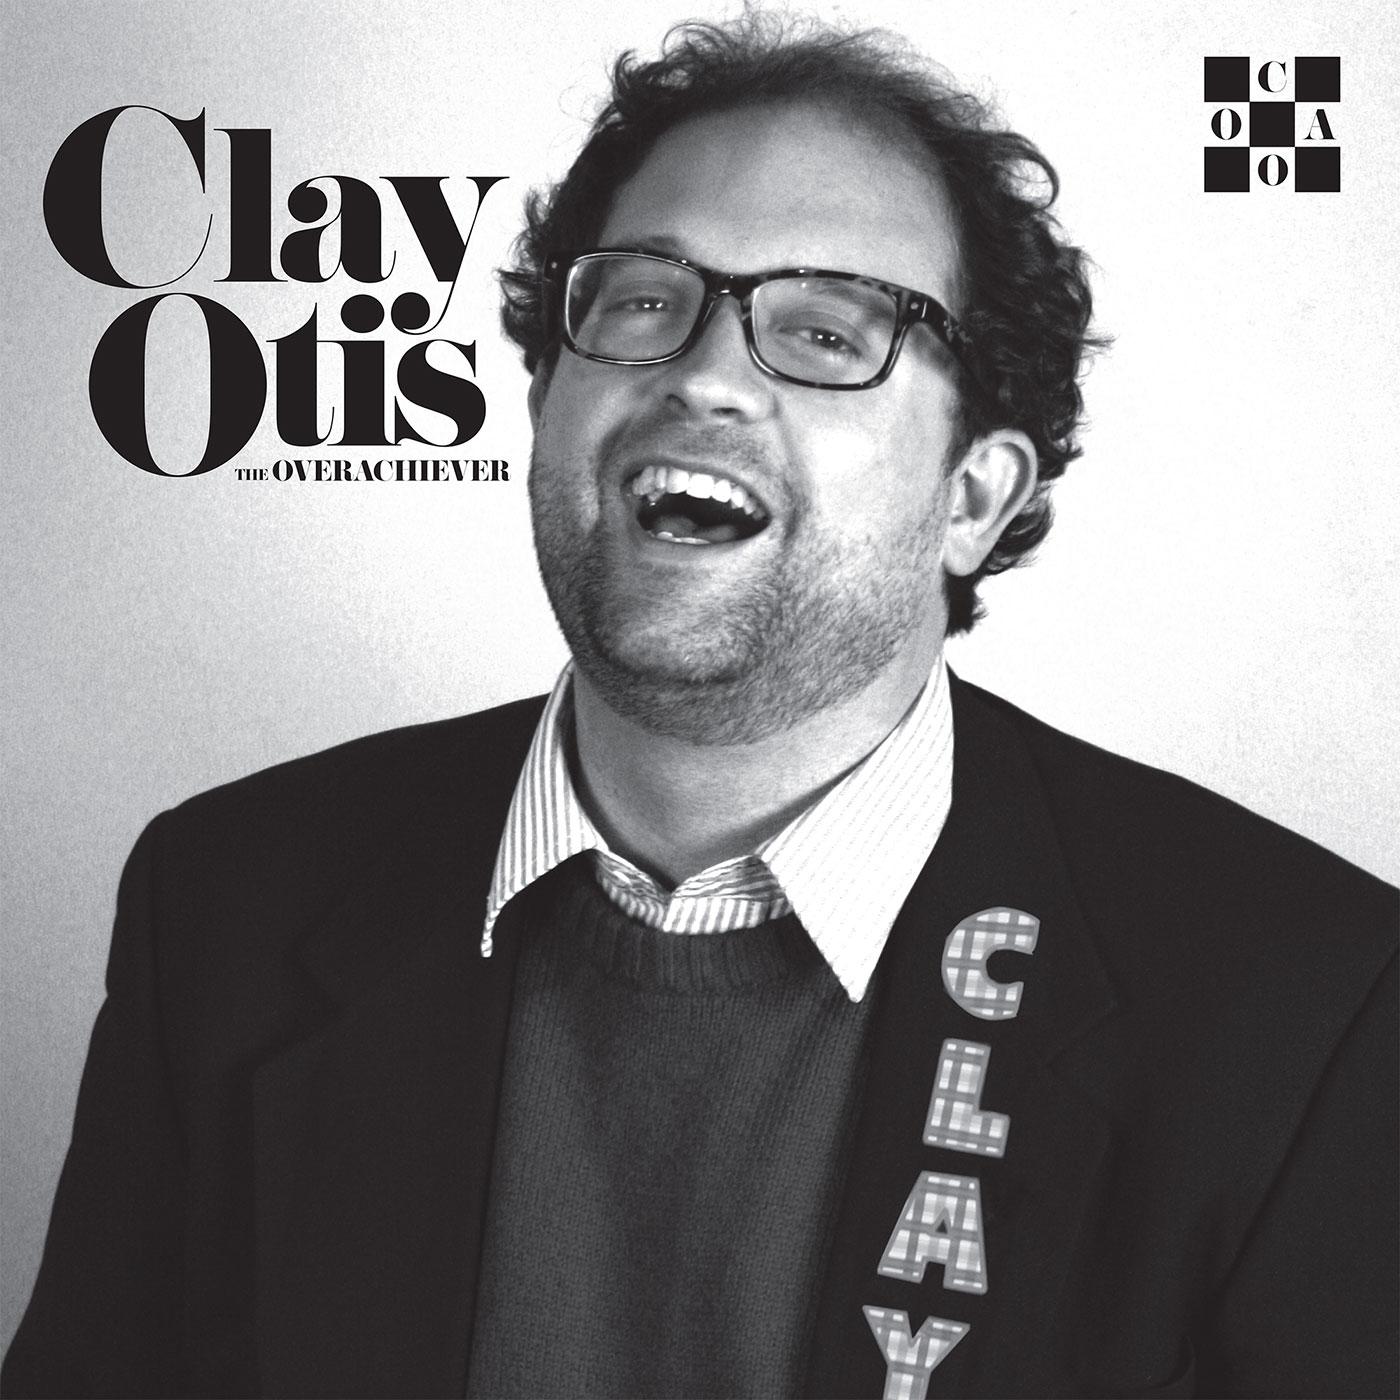 Clay Otis - The Overachiever